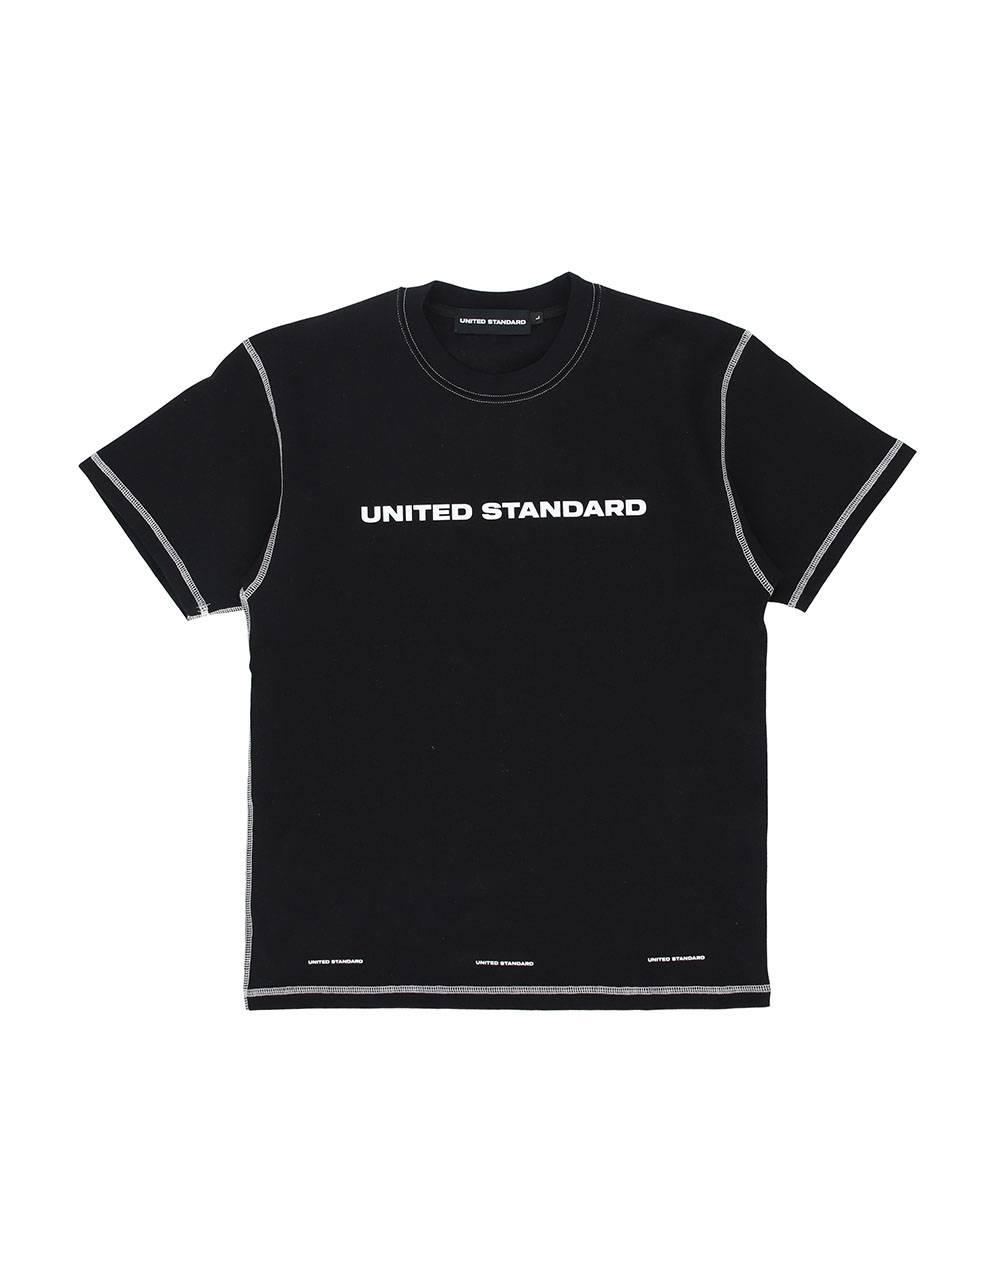 United Standard logo t-shirt - black United Standard T-shirt 56,56€